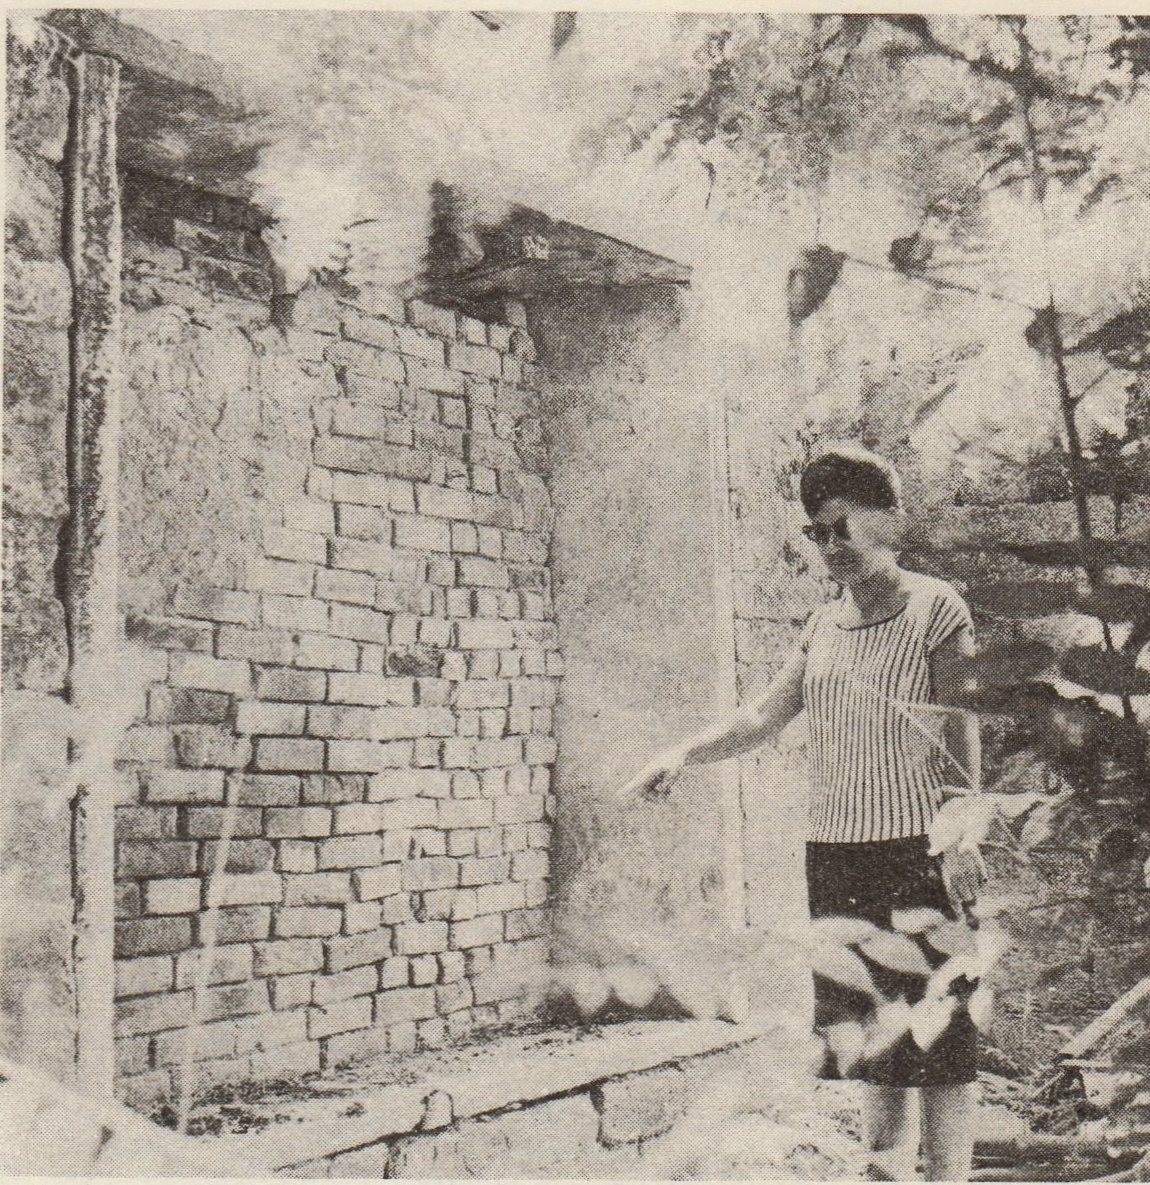 O Χουρσίτ Πασάς στη Λάρισα. Του Νικολάου Παπαθεοδώρου